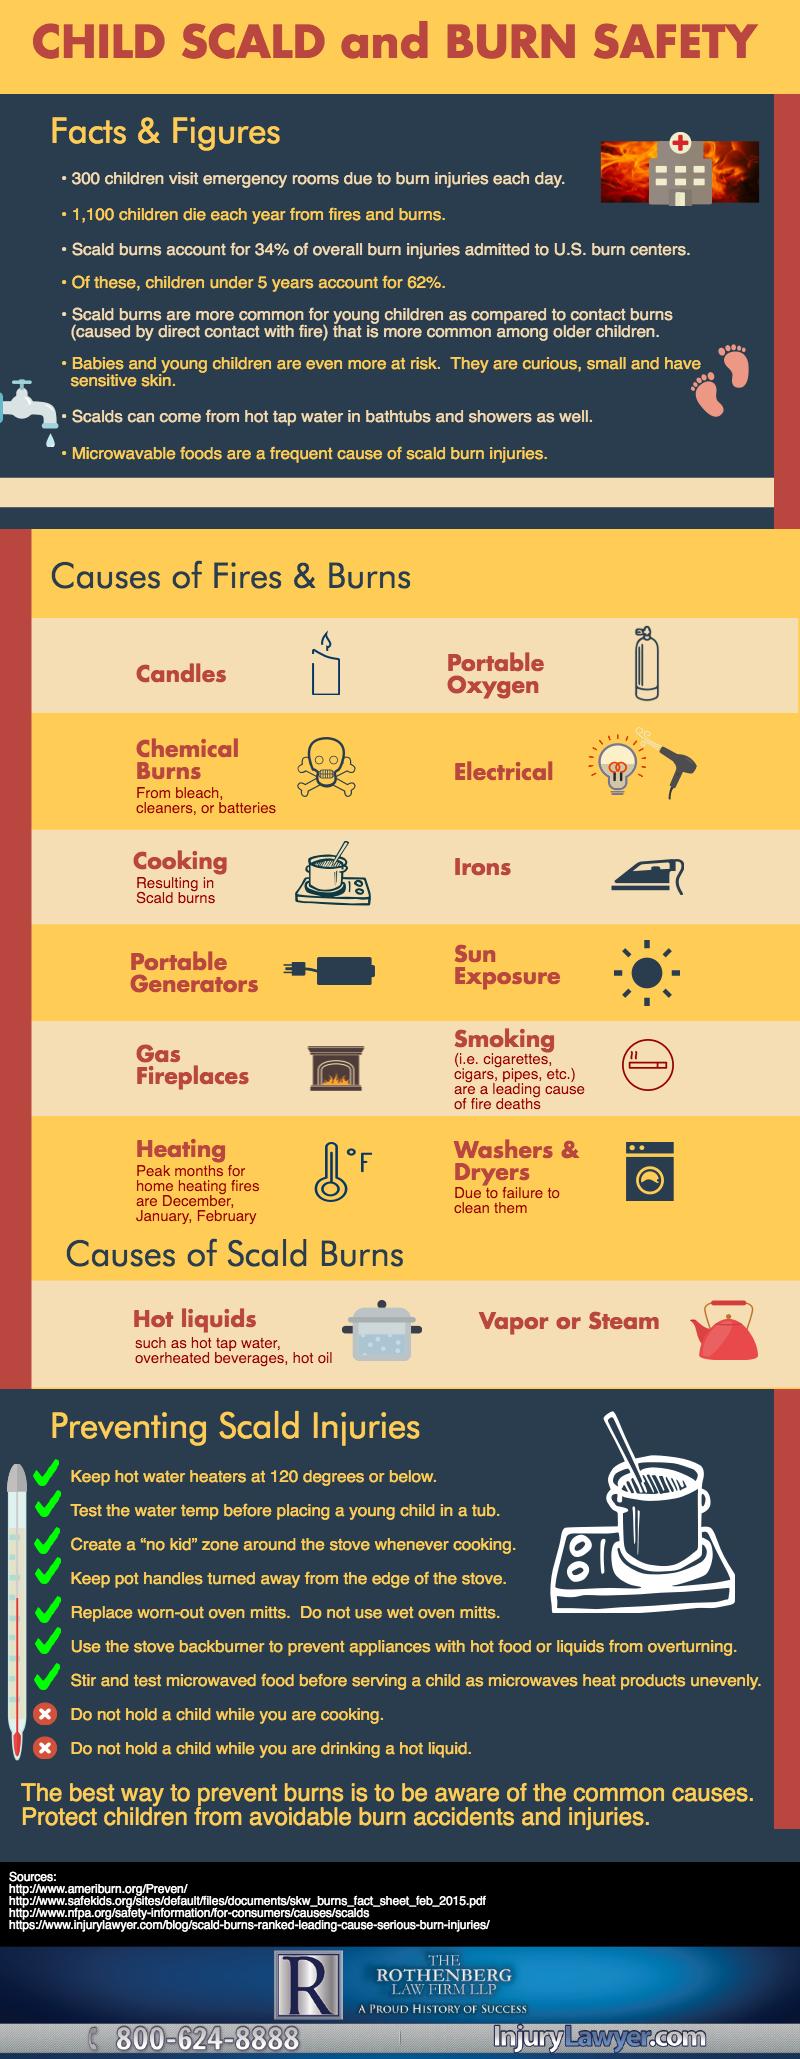 Child Burn Safety infographic